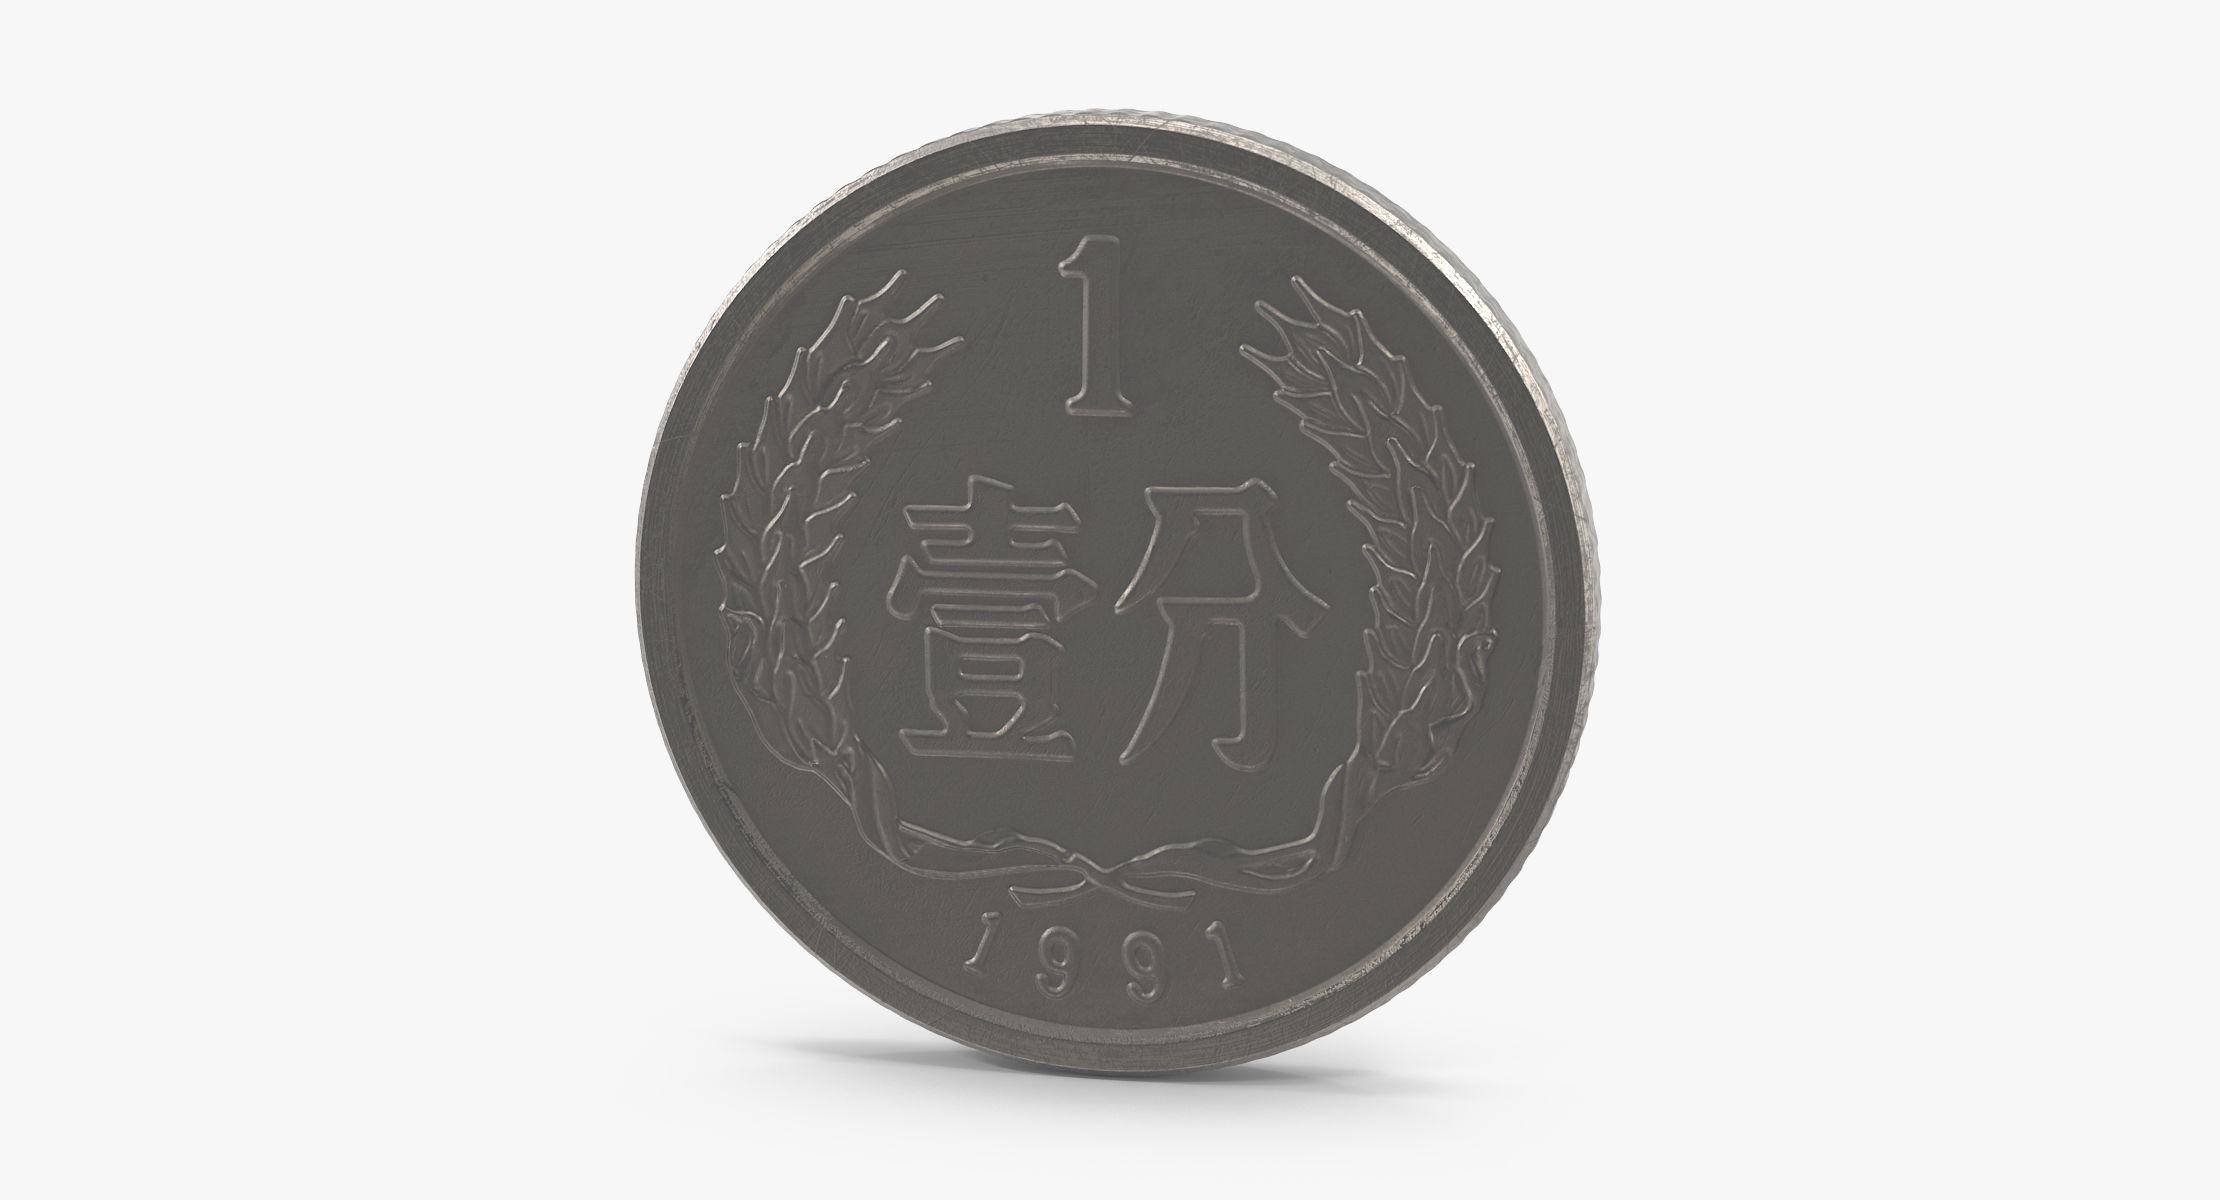 1 Fen China - reel 1